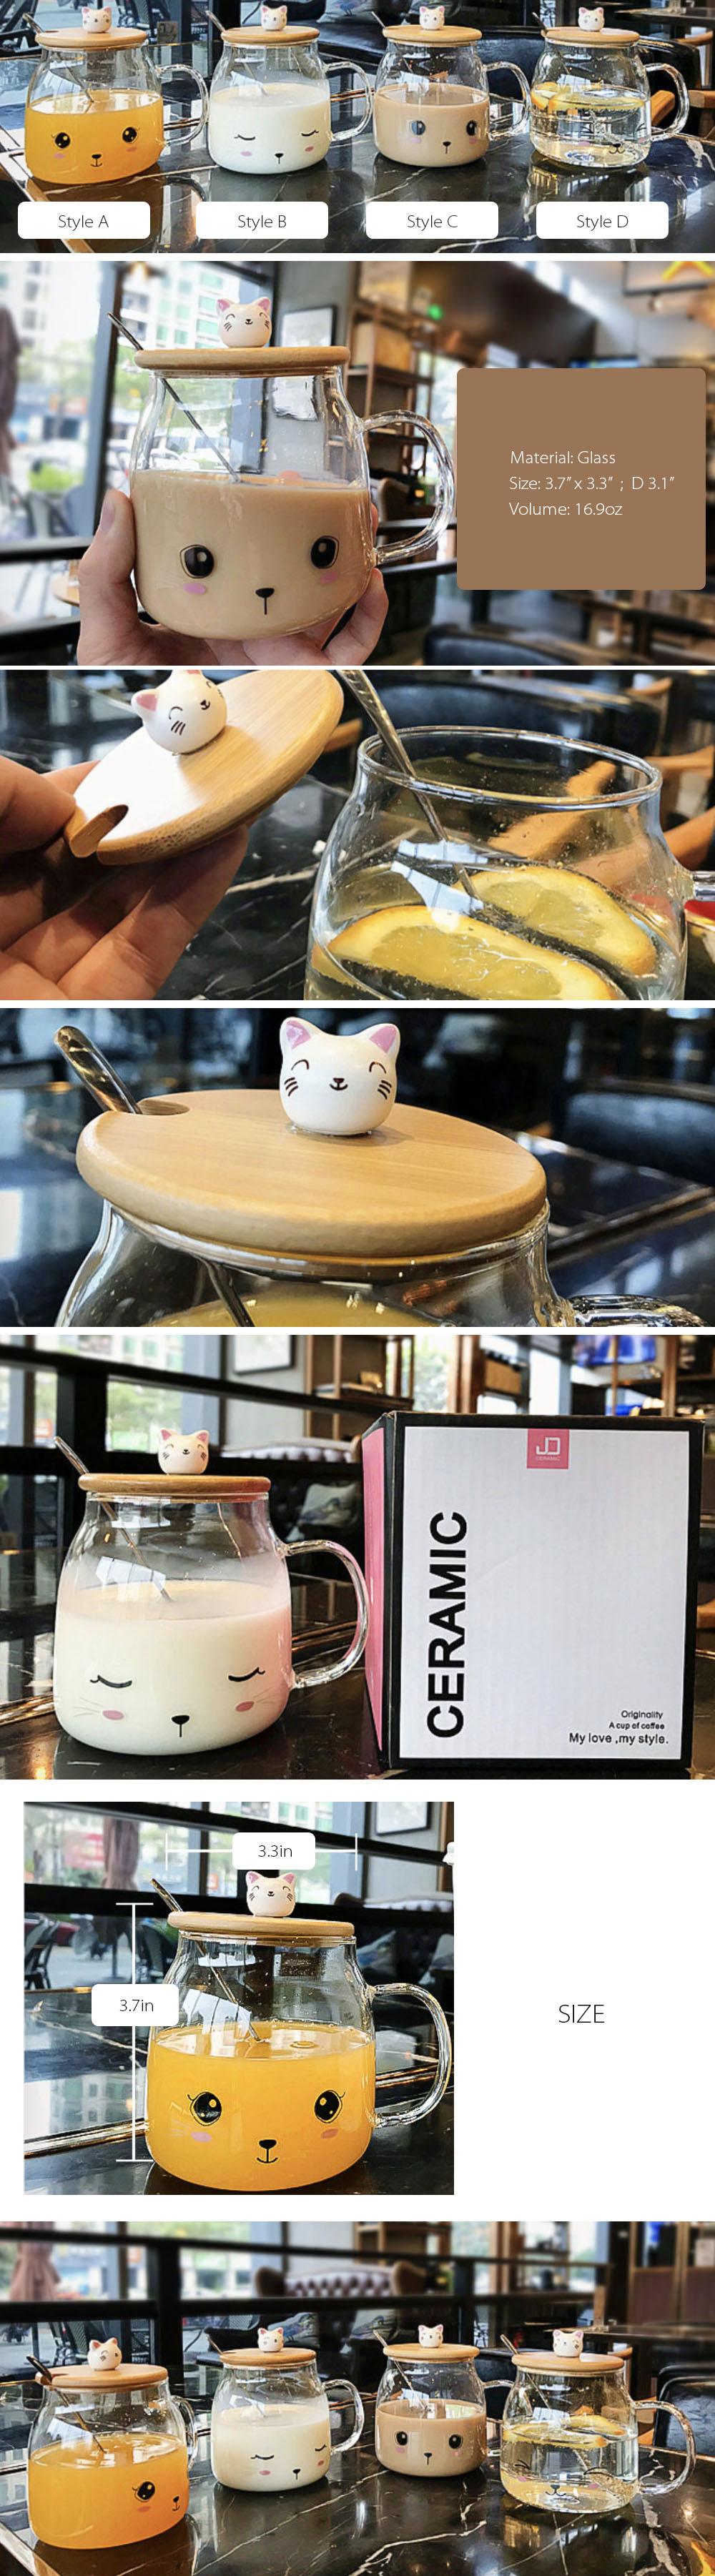 Cute Cat Cup Mug, Lid and Spoon Set